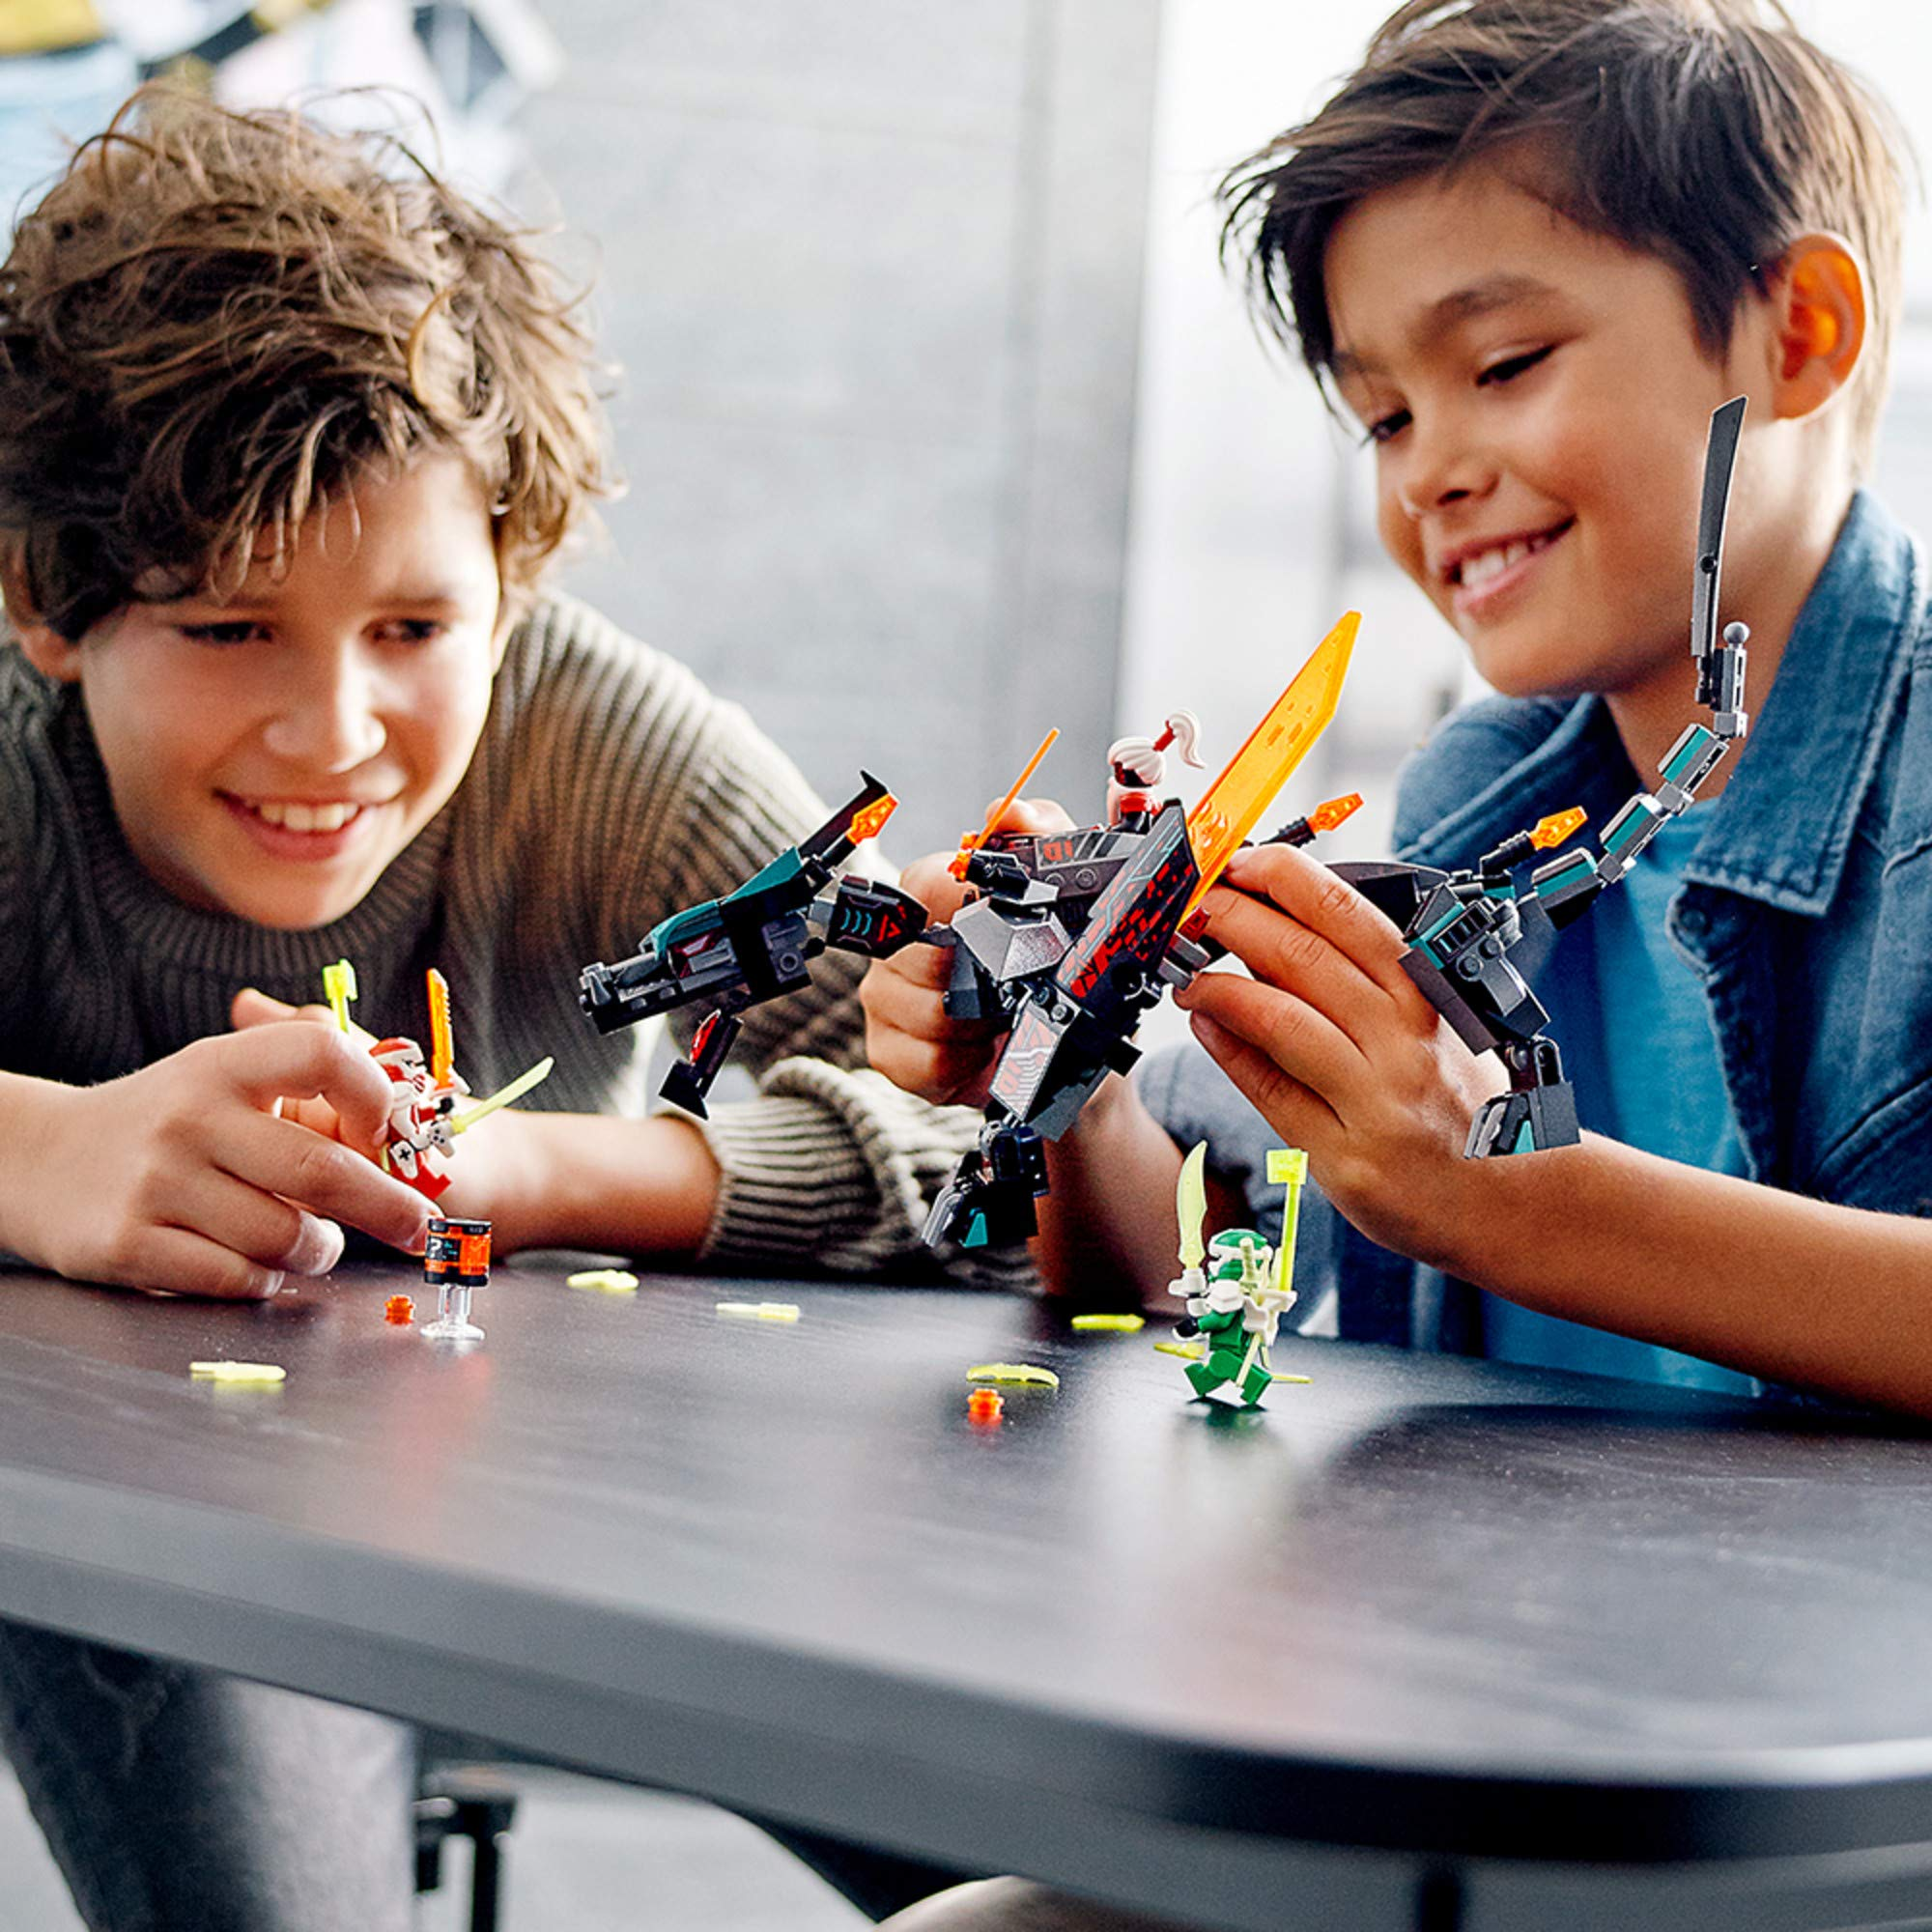 Lego 71713 NINJAGO Empire Dragon Ninja Toy Building Kit 286 pcs NEW in HAND